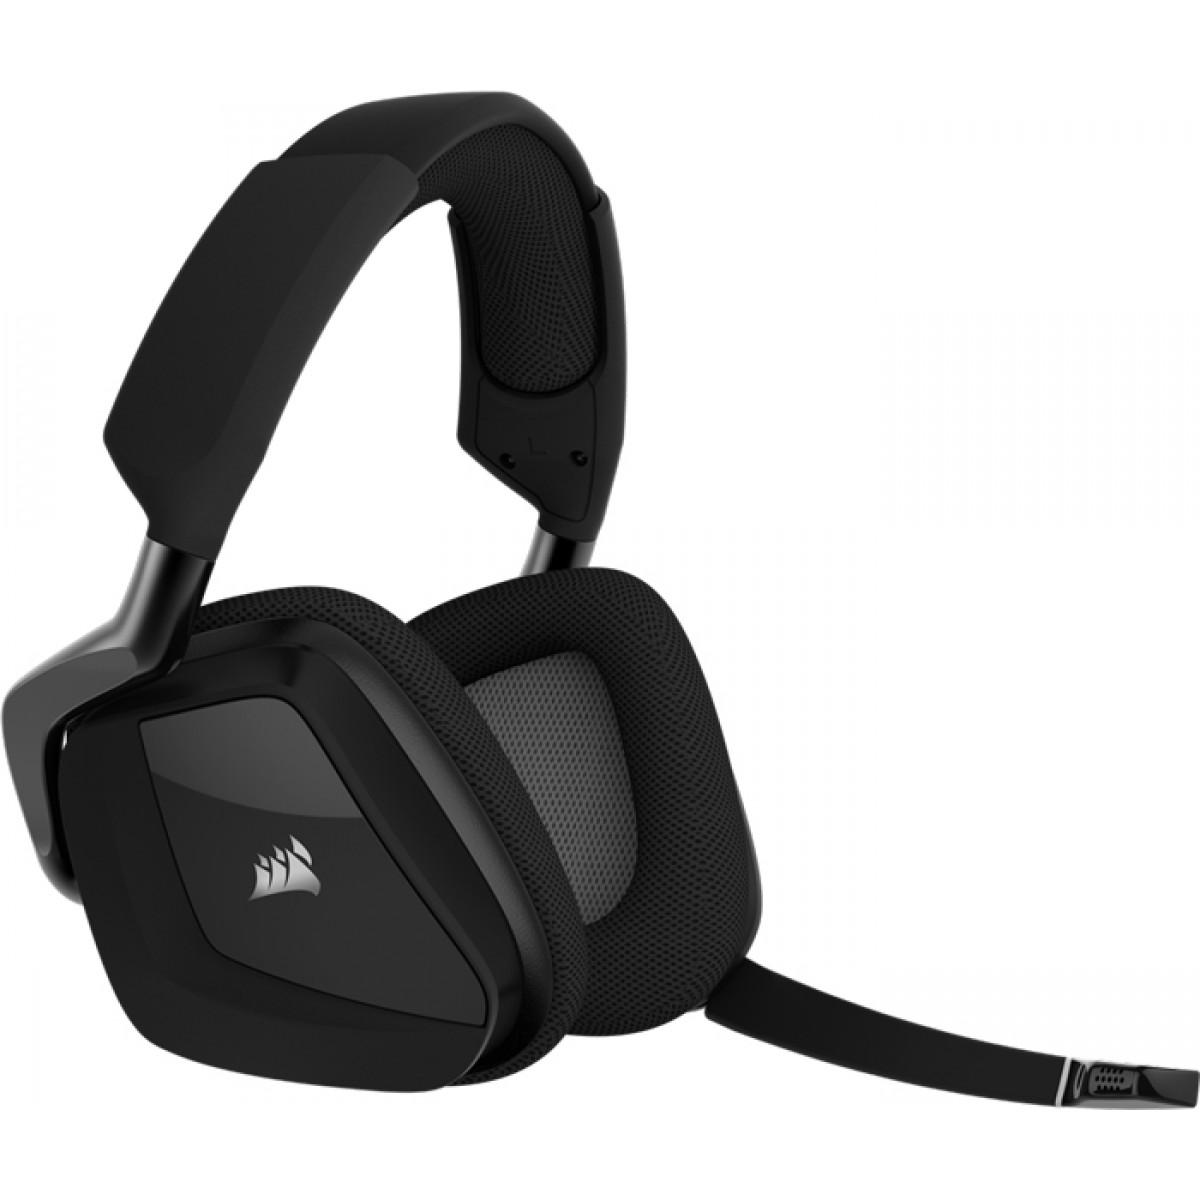 Headset Gamer Corsair Void Pro RGB, Dolby 7.1, Wireless, Black, CA-9011152-NA